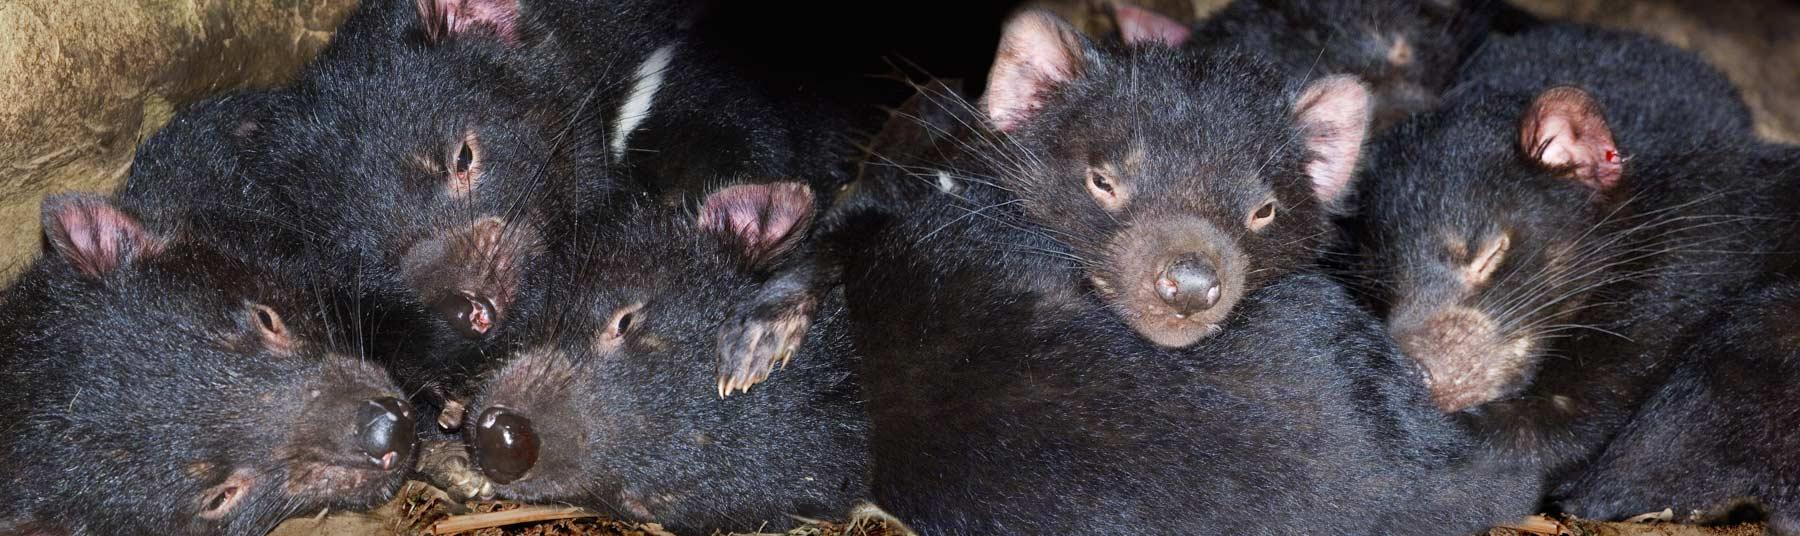 Sleeping Tasmanian Devils